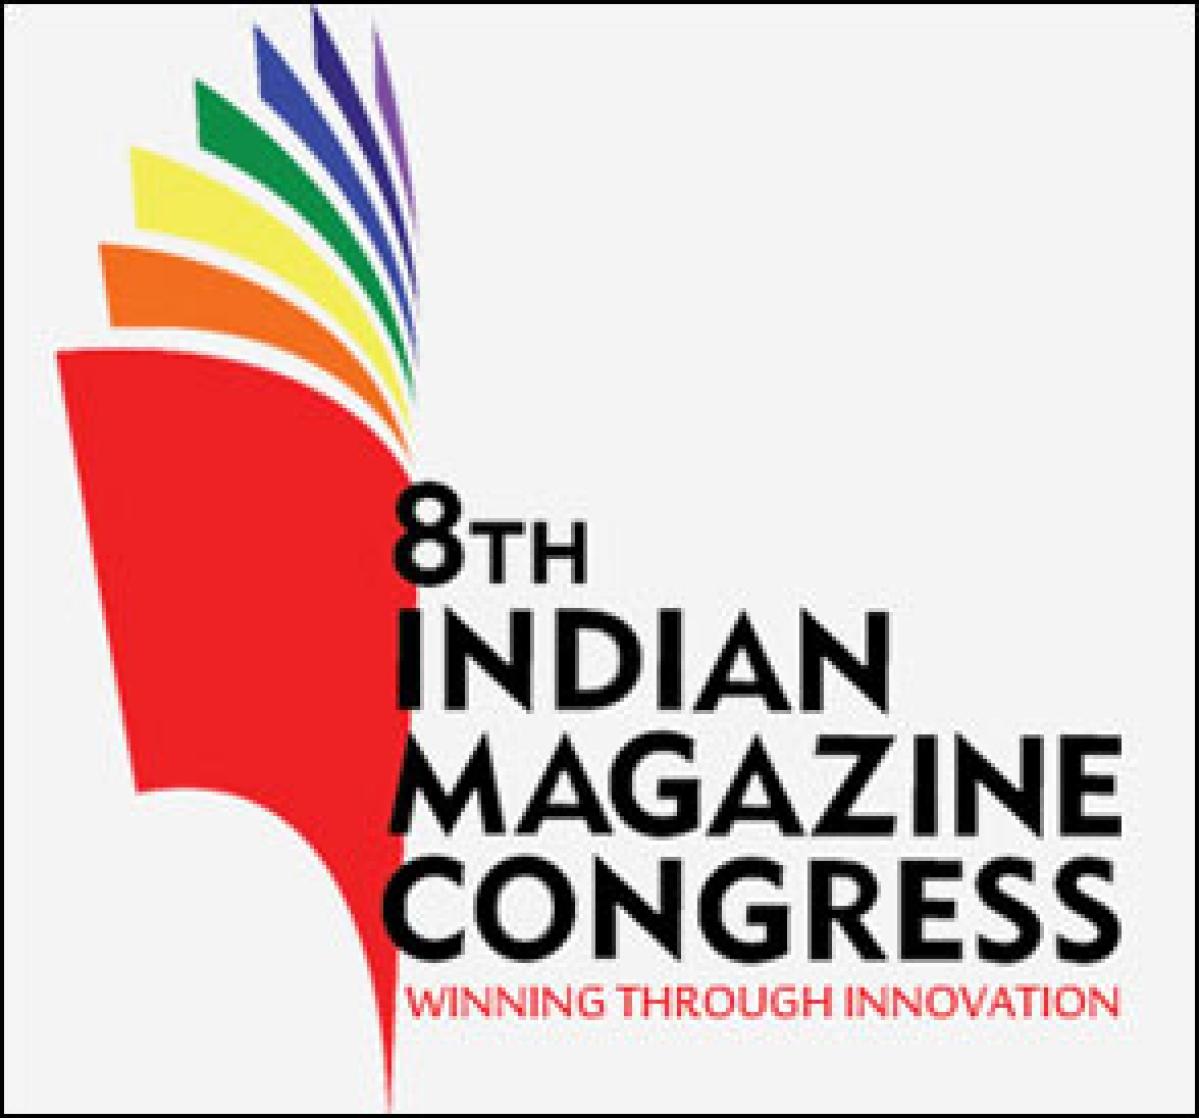 Indian Magazine Congress: Online Content = Information Overload?